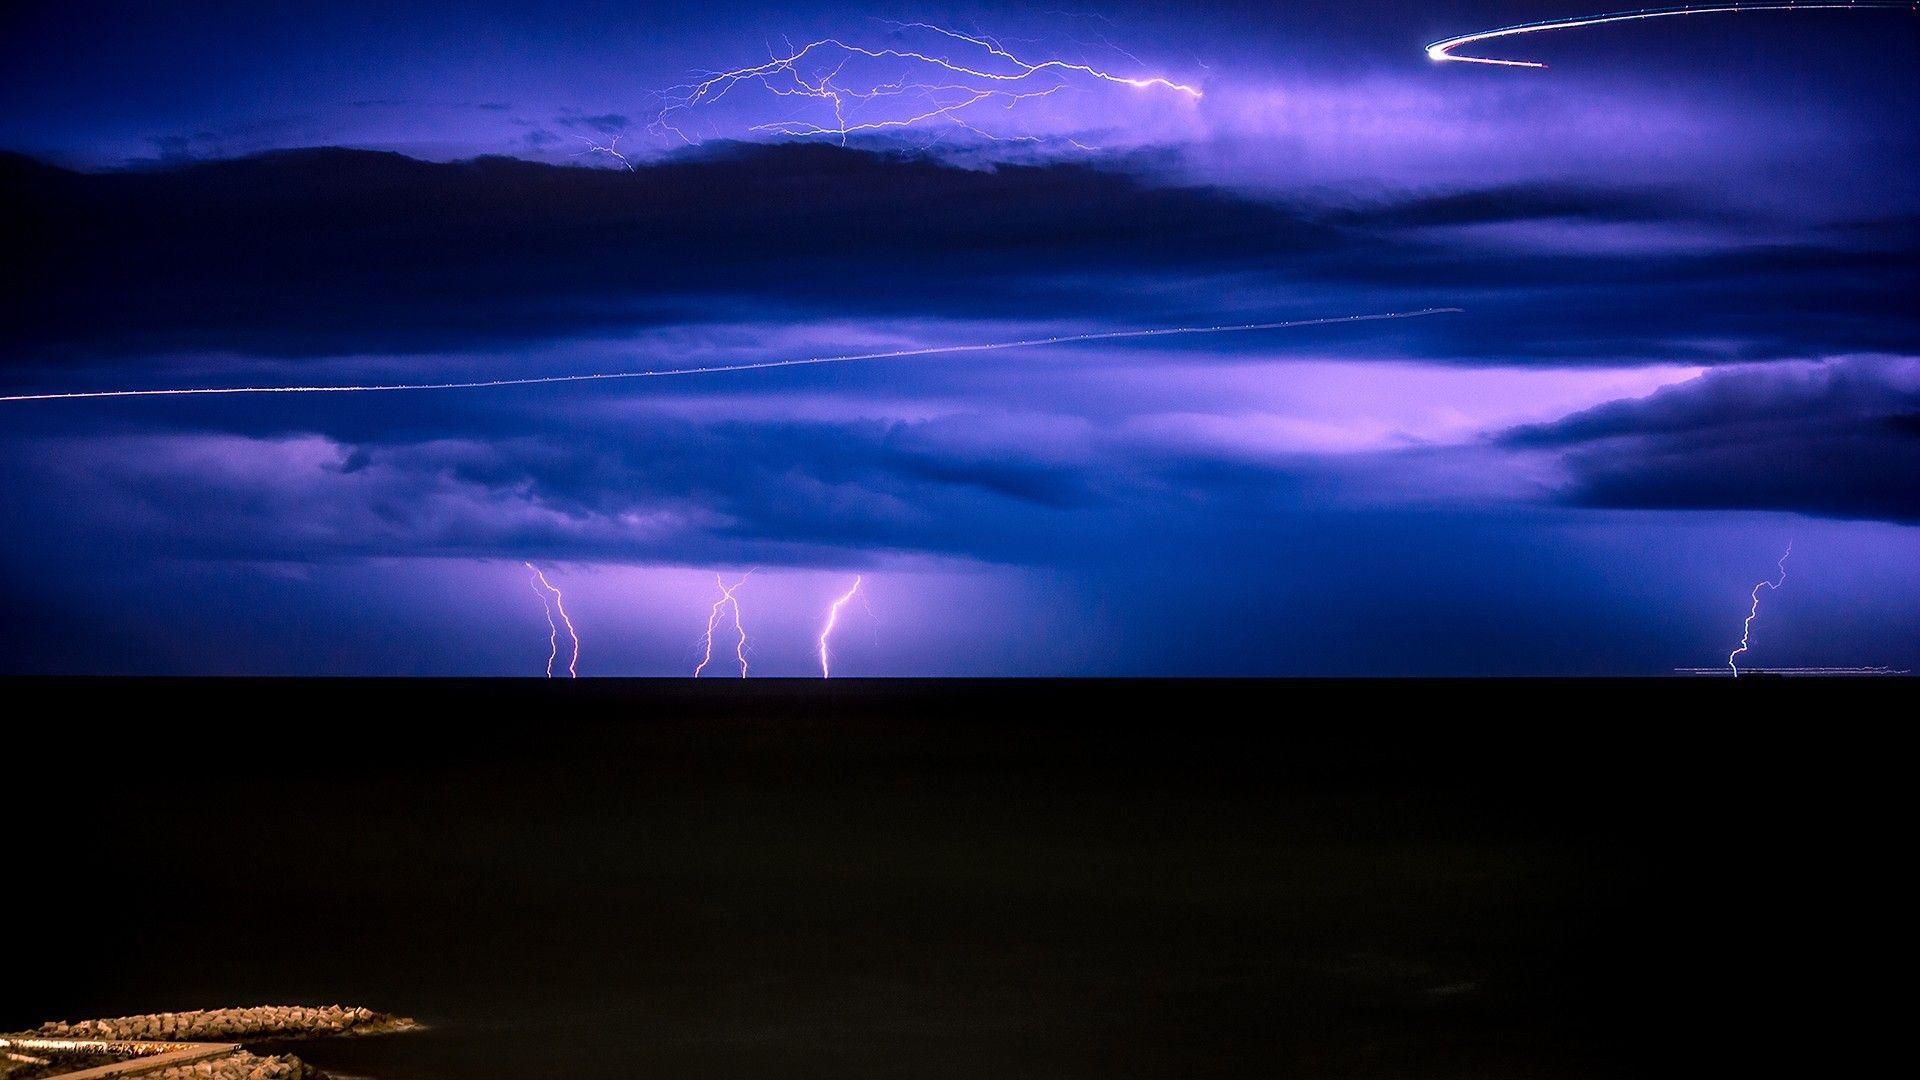 Lightning Over A Black Sea 1920x1080 Black Sea Via Www Allwallpaper In Background Screensavers Storm Wallpaper Light Pollution